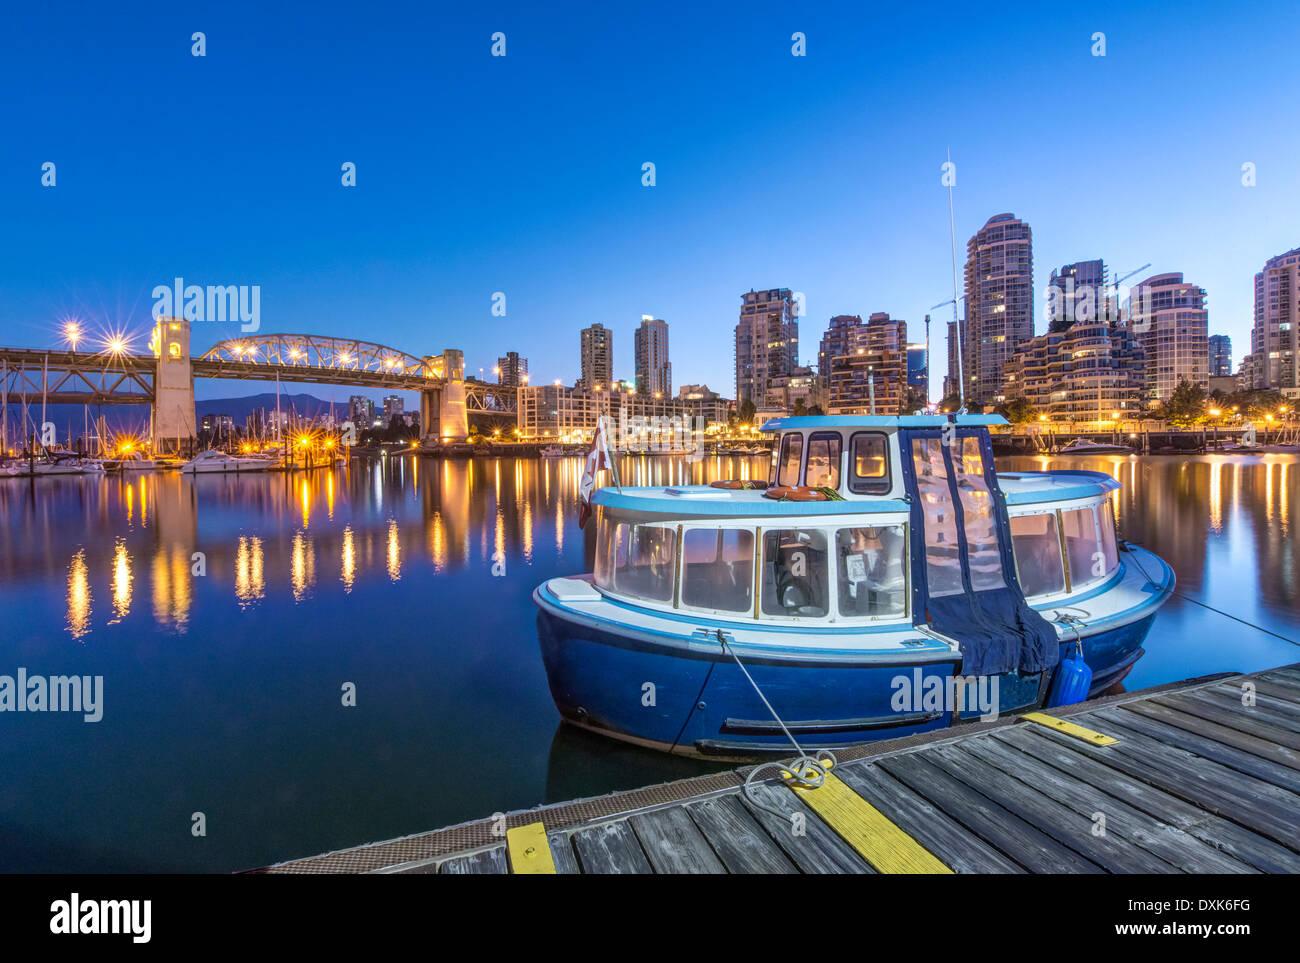 Waterfront skyline and harbor illuminated at night, Vancouver, British Columbia, Canada - Stock Image